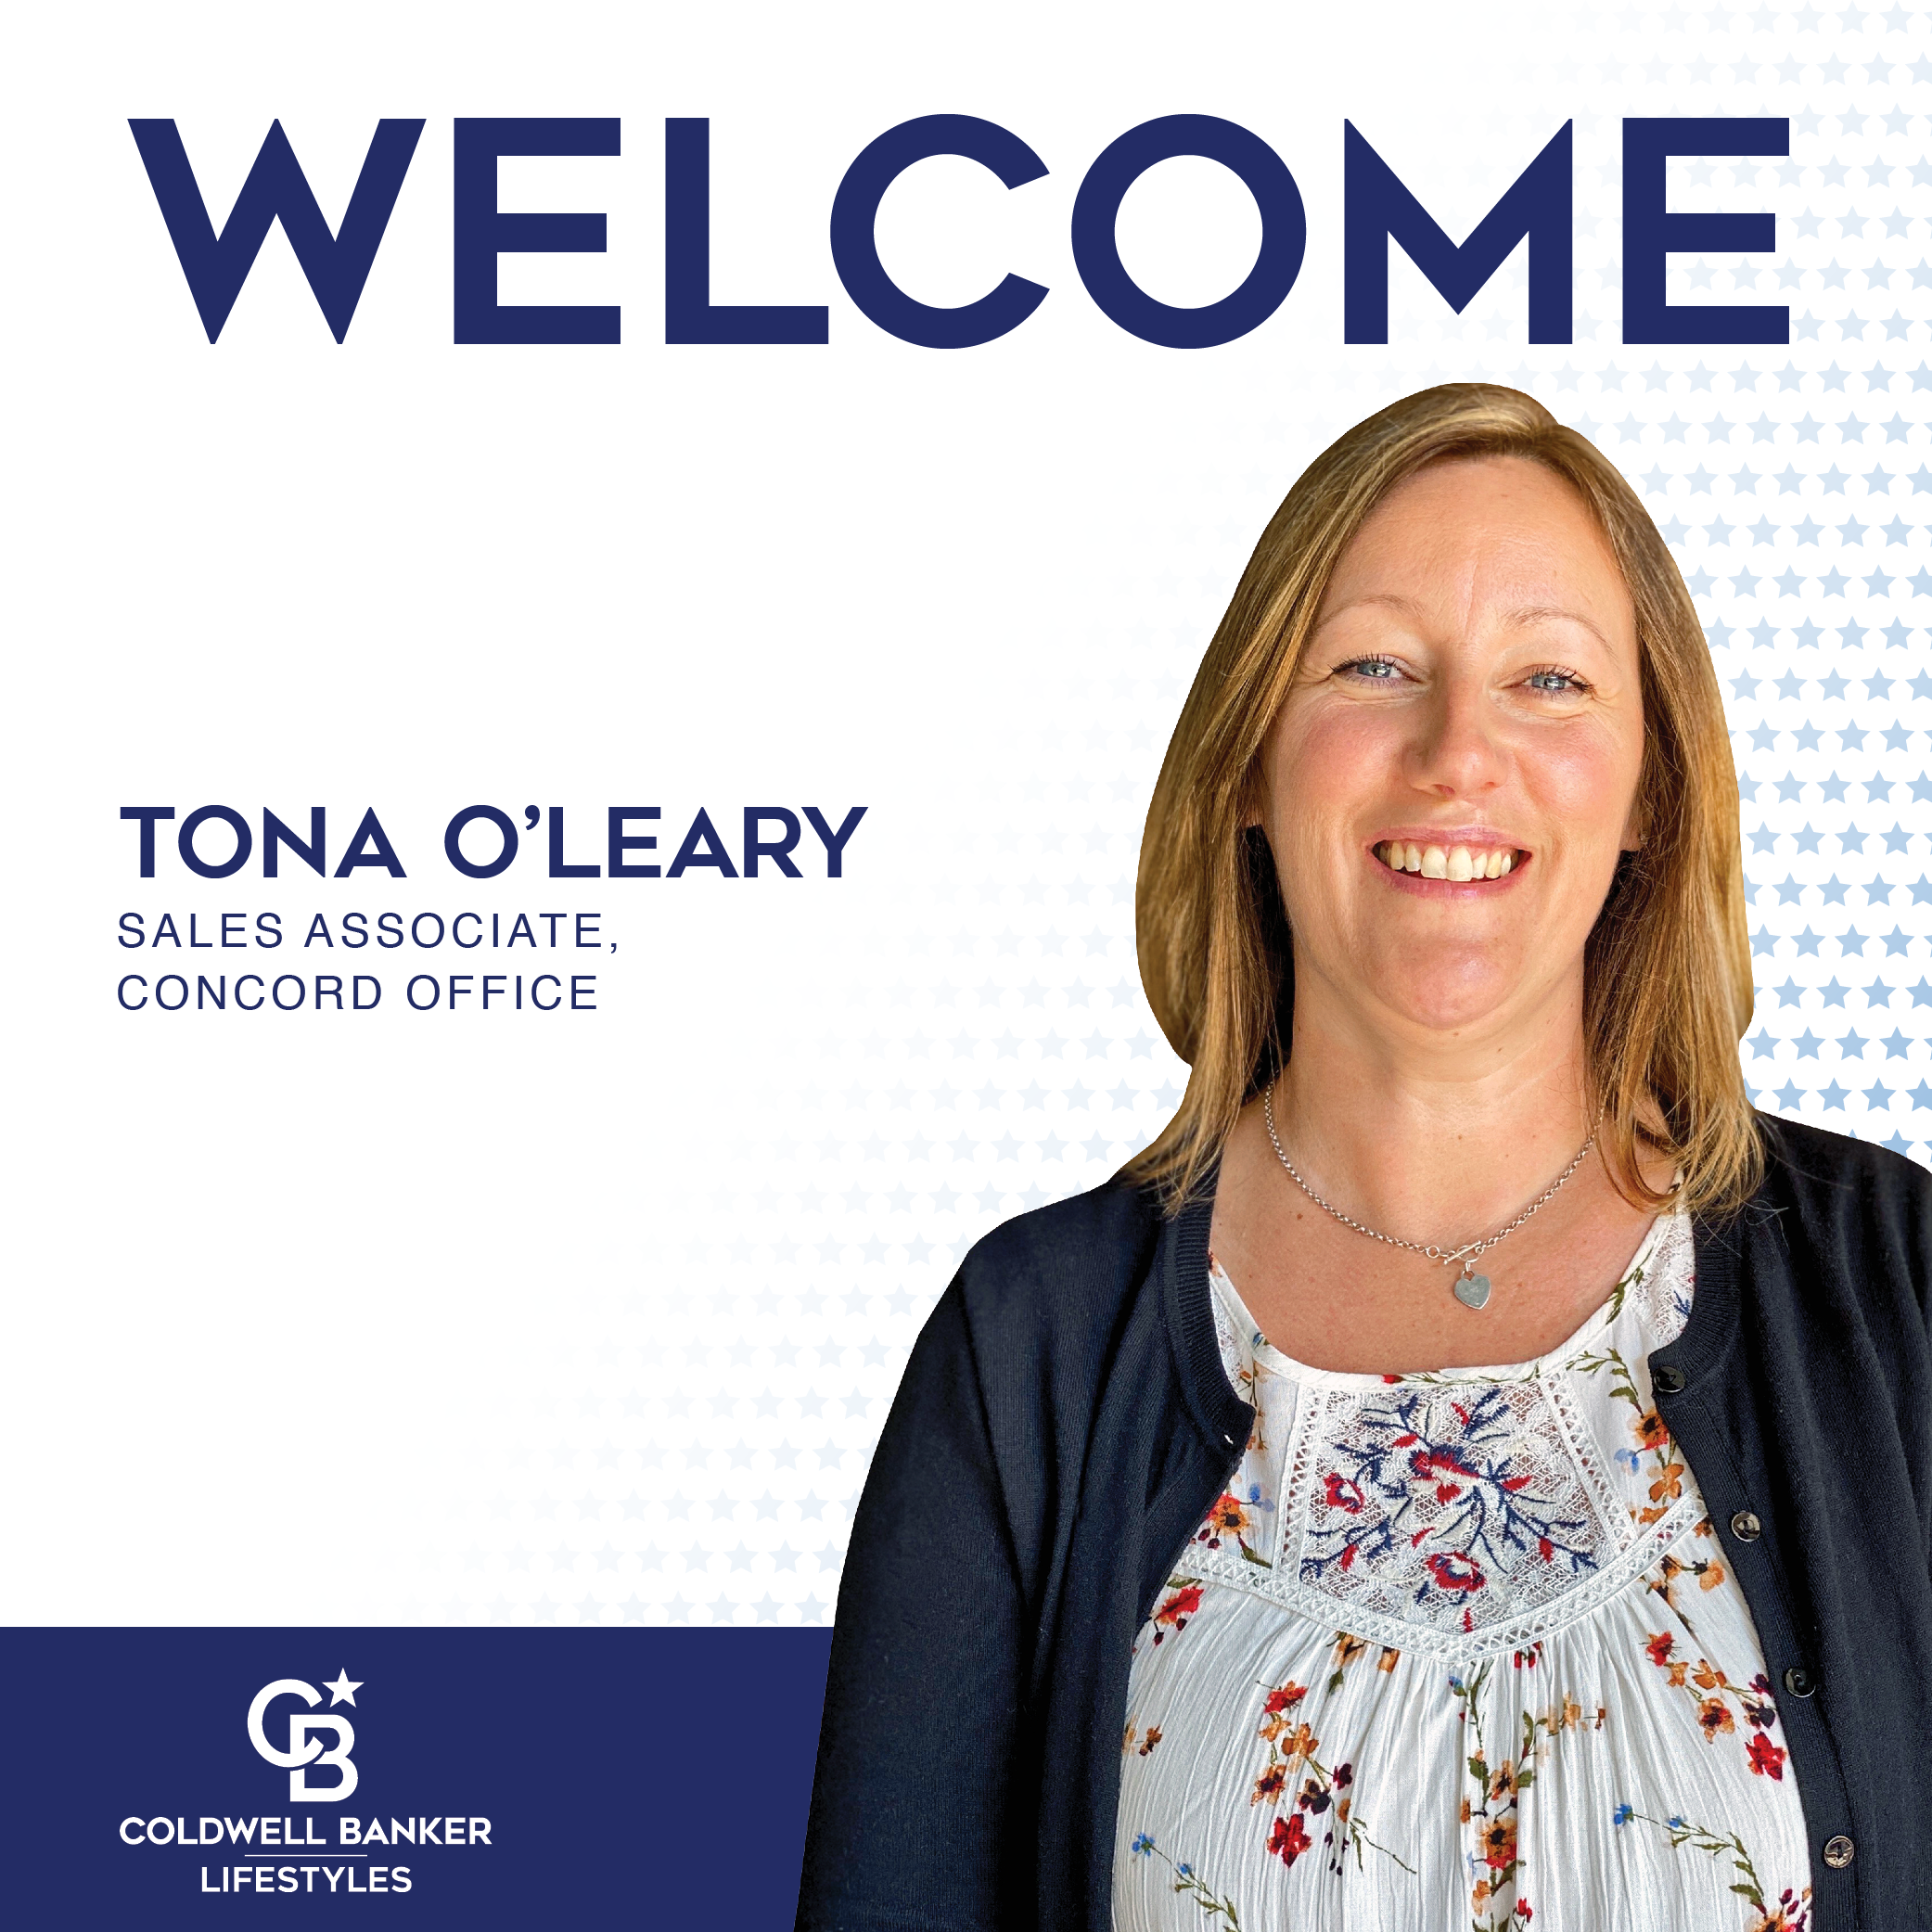 Tona O'Leary, Sales Associate, Concord Office